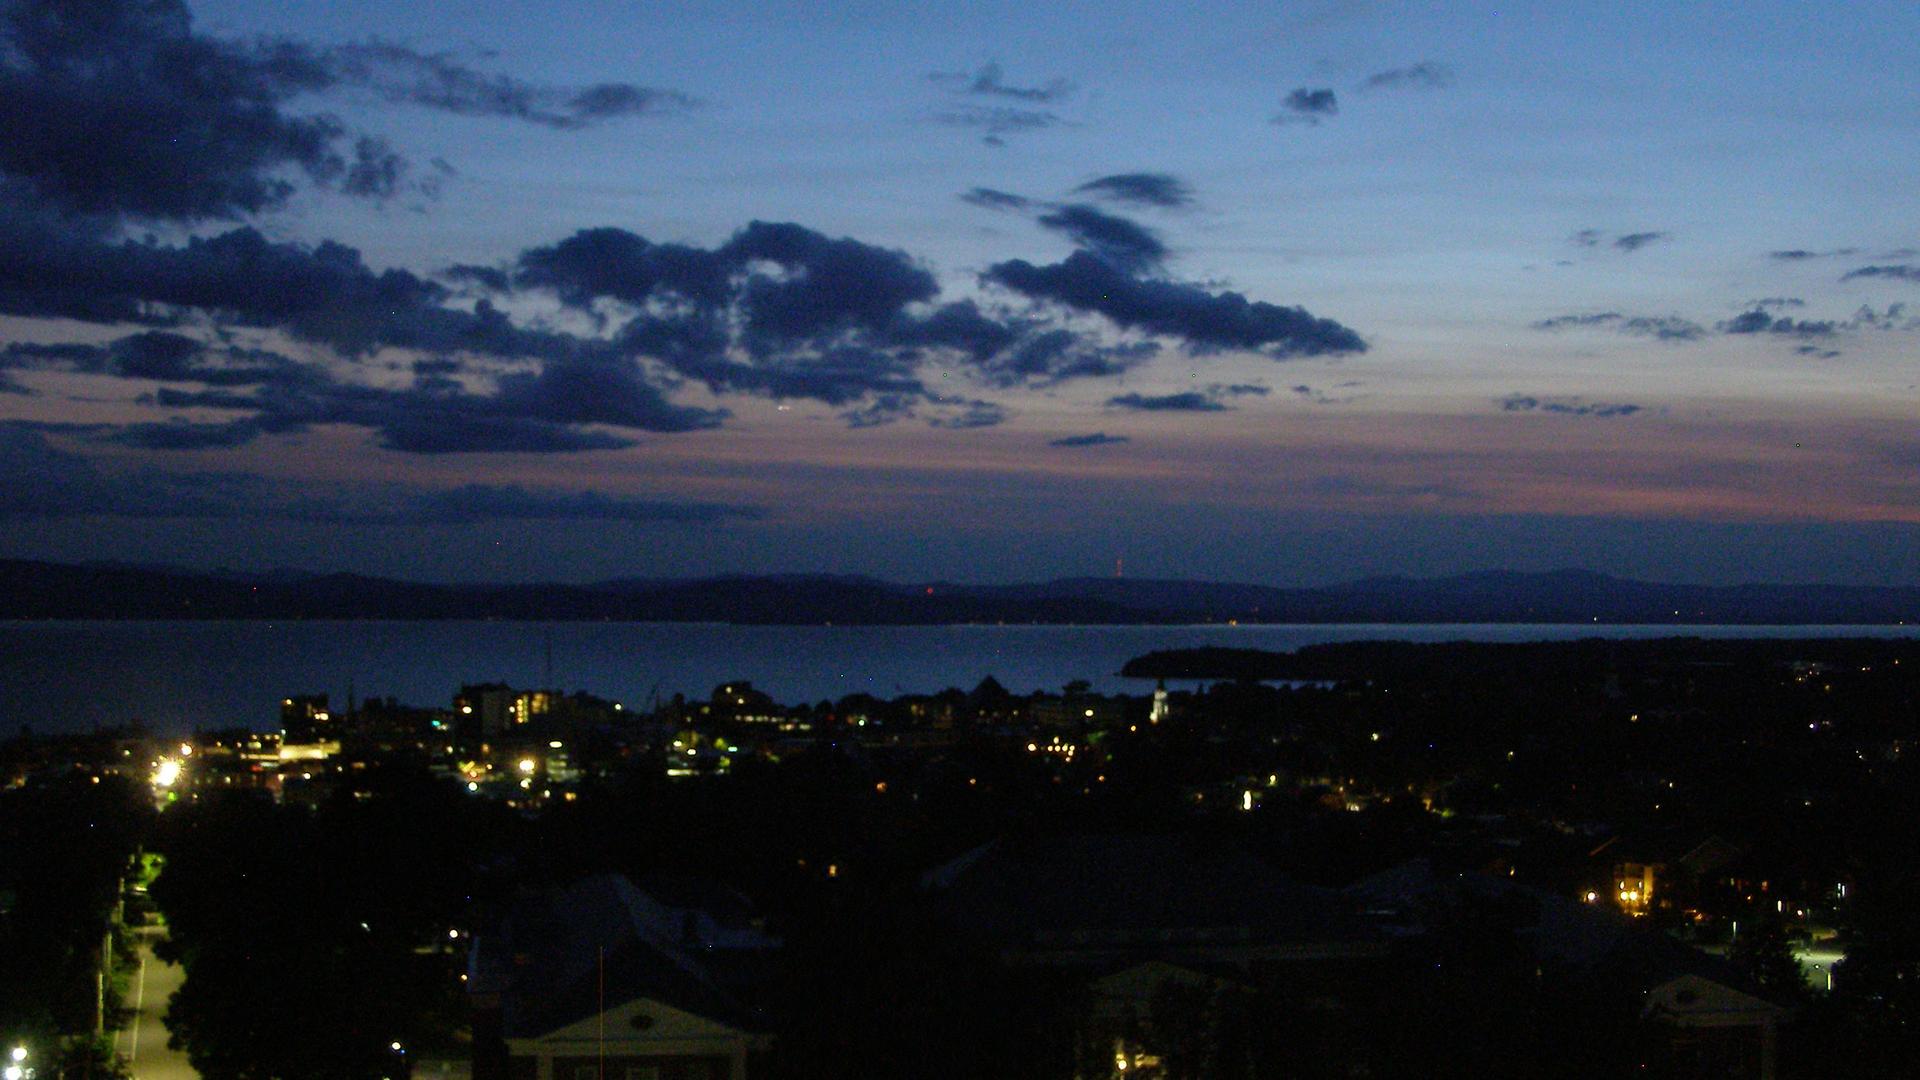 Webkamera Catlinsburg (historical): Burlington, VT Northwest